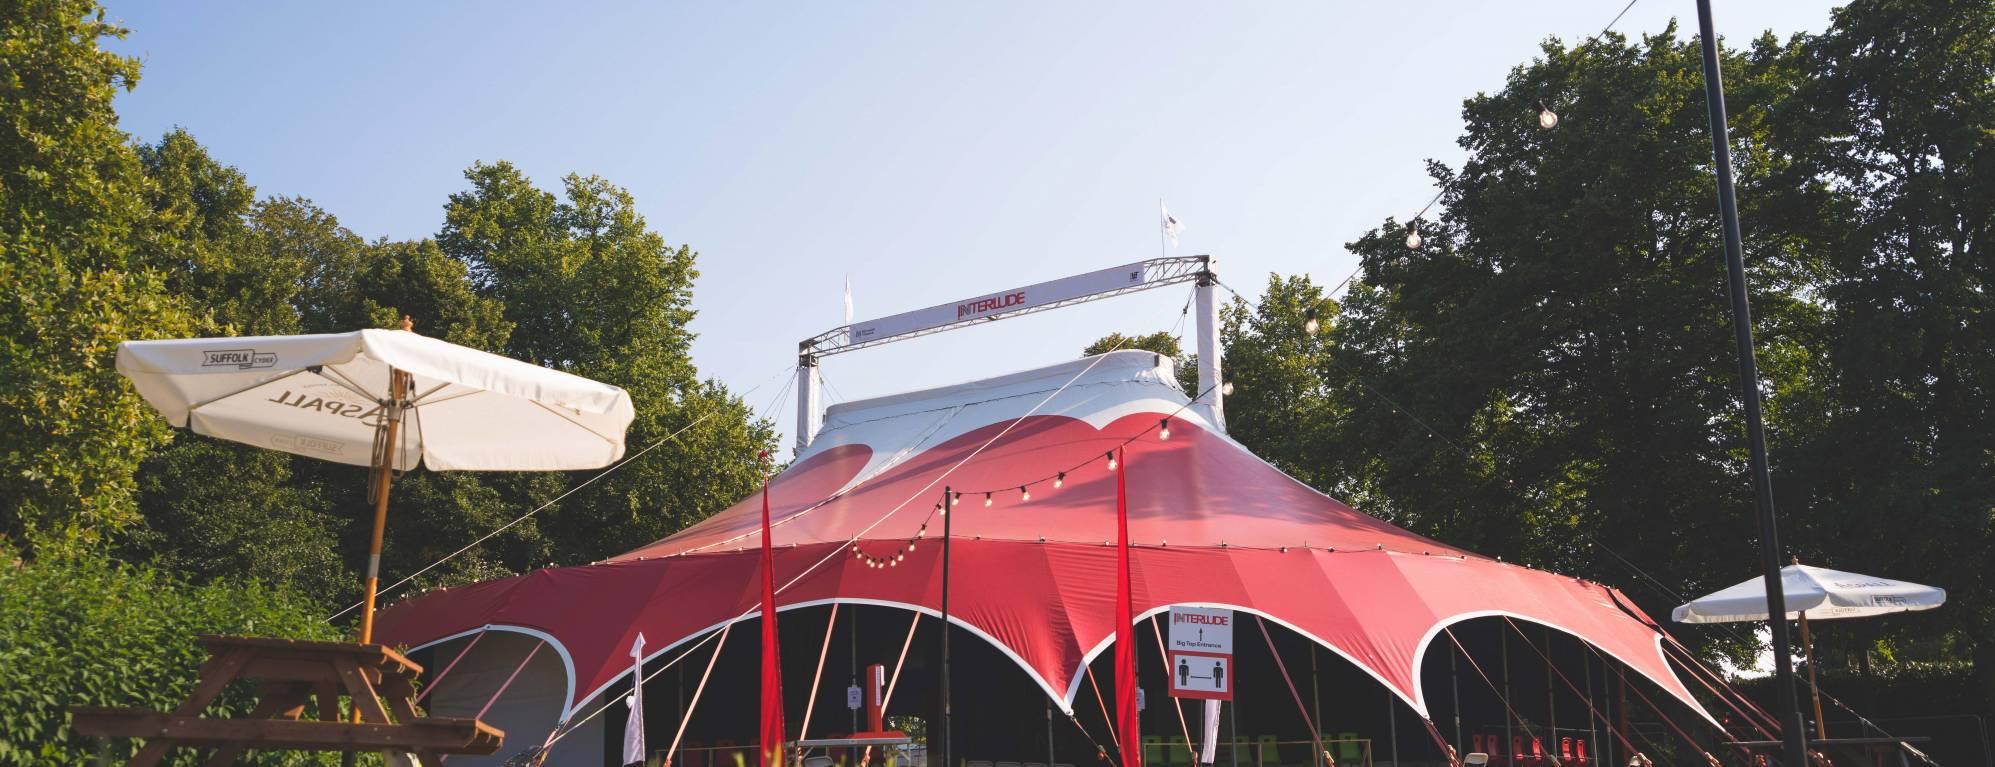 INTERLUDE Tent at Chapelfield Gardens